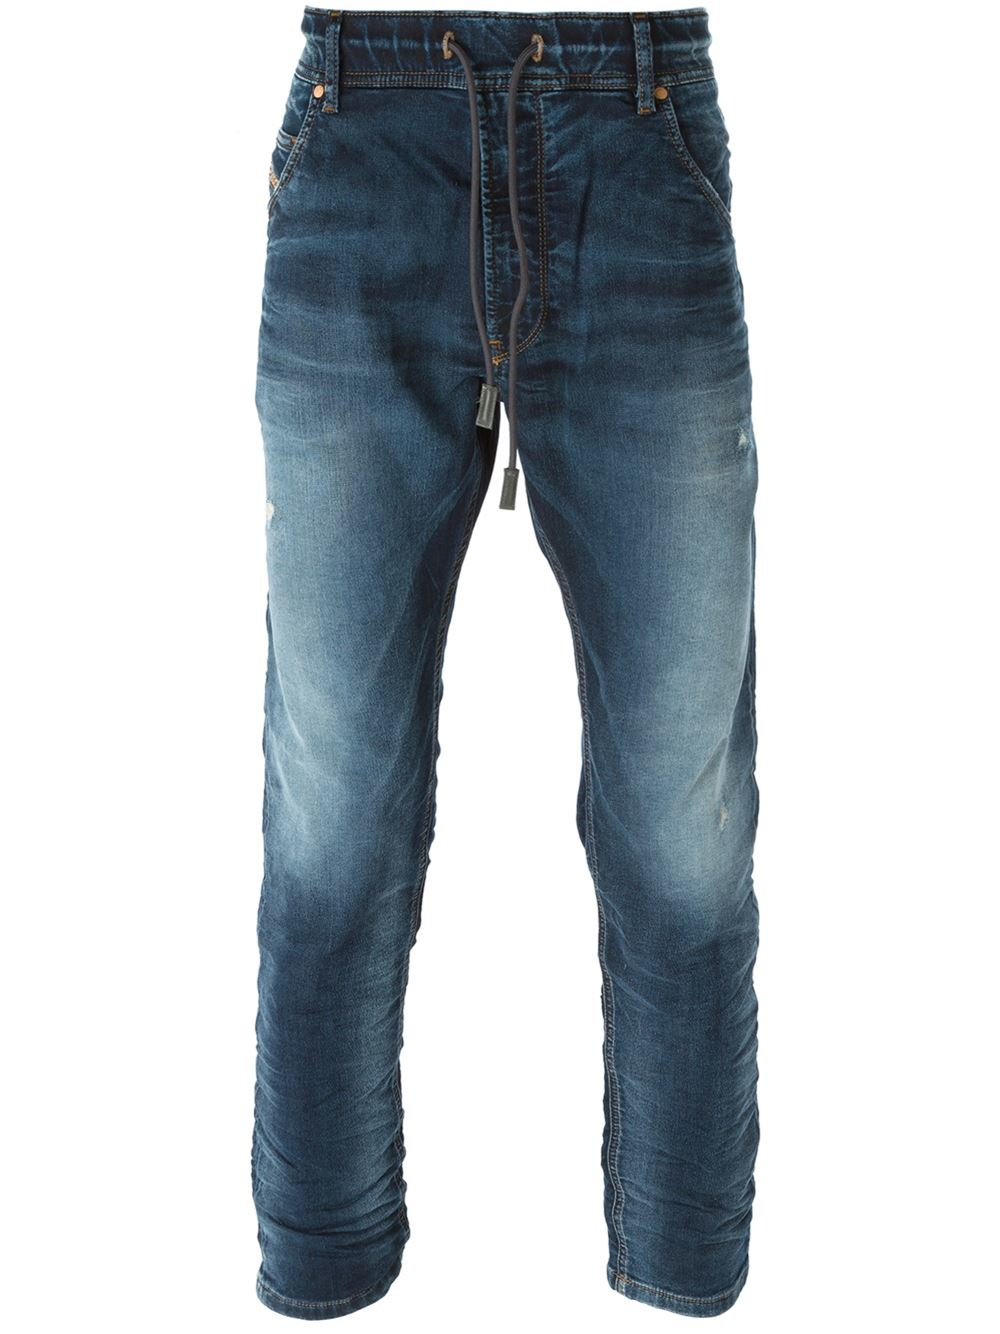 Mens Slim Fit Tapered Leg Jeans